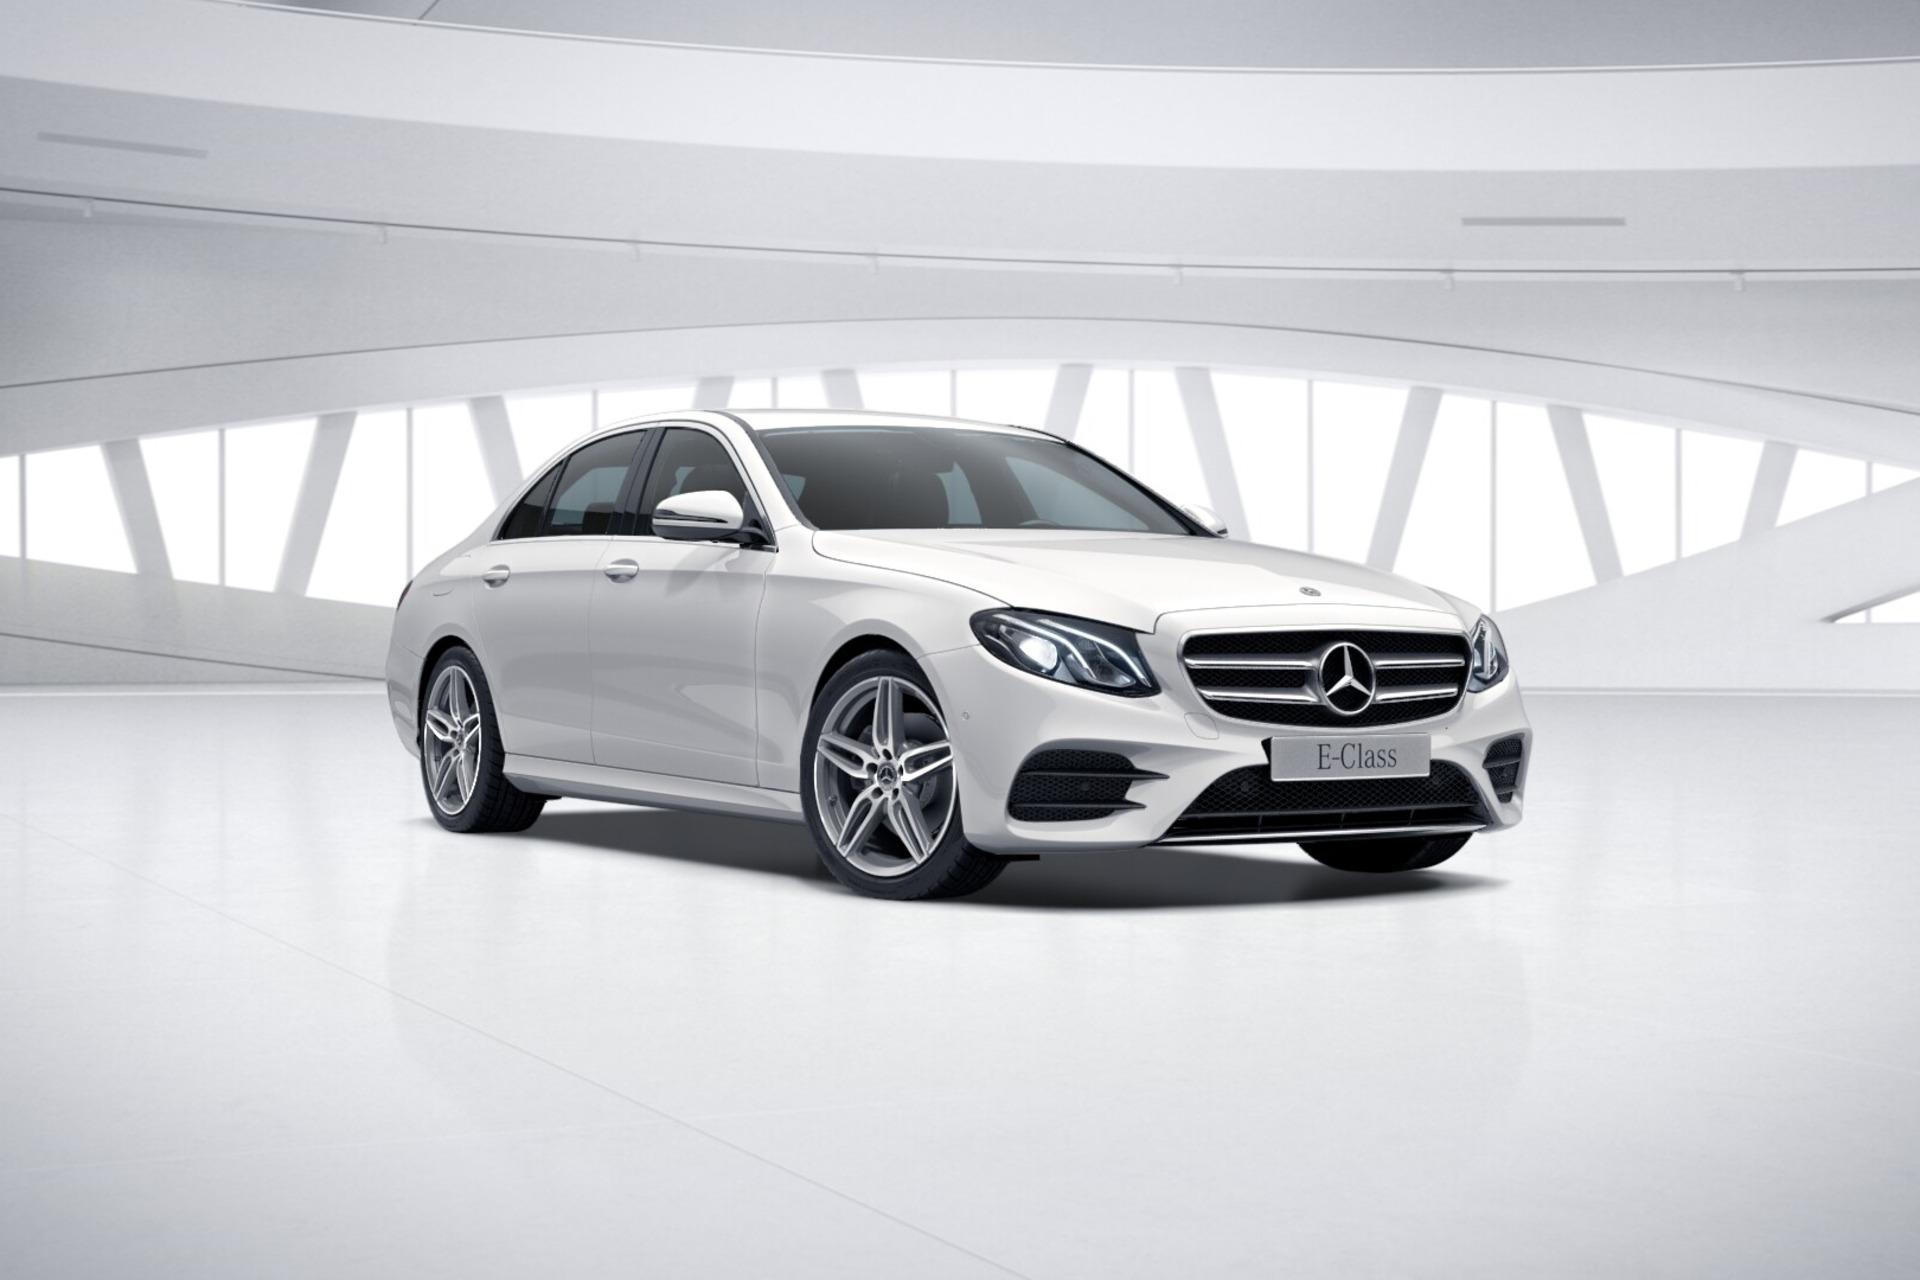 Mercedes-Benz E-Class Limousine 952611421